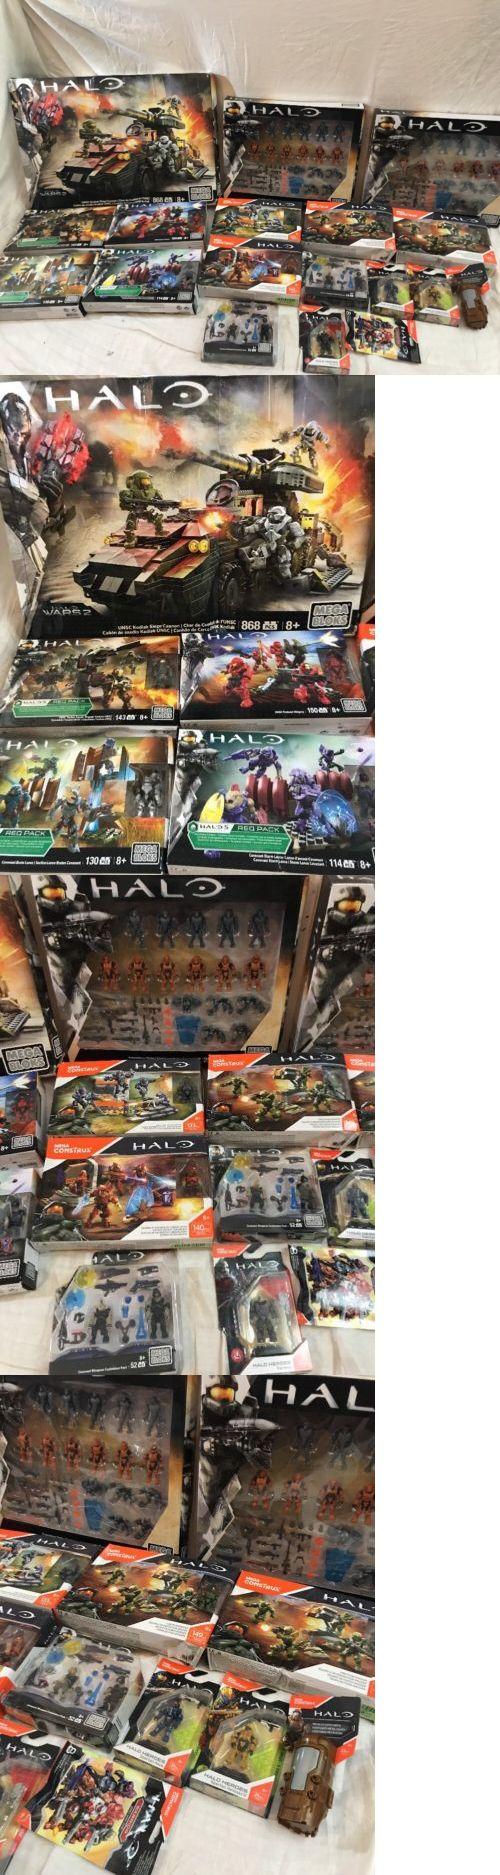 Mega Bloks 52338: Halo Mega Bloks Mega Construx Instant Collection Lot Of 18 Sets Damaged Boxes -> BUY IT NOW ONLY: $260 on eBay!